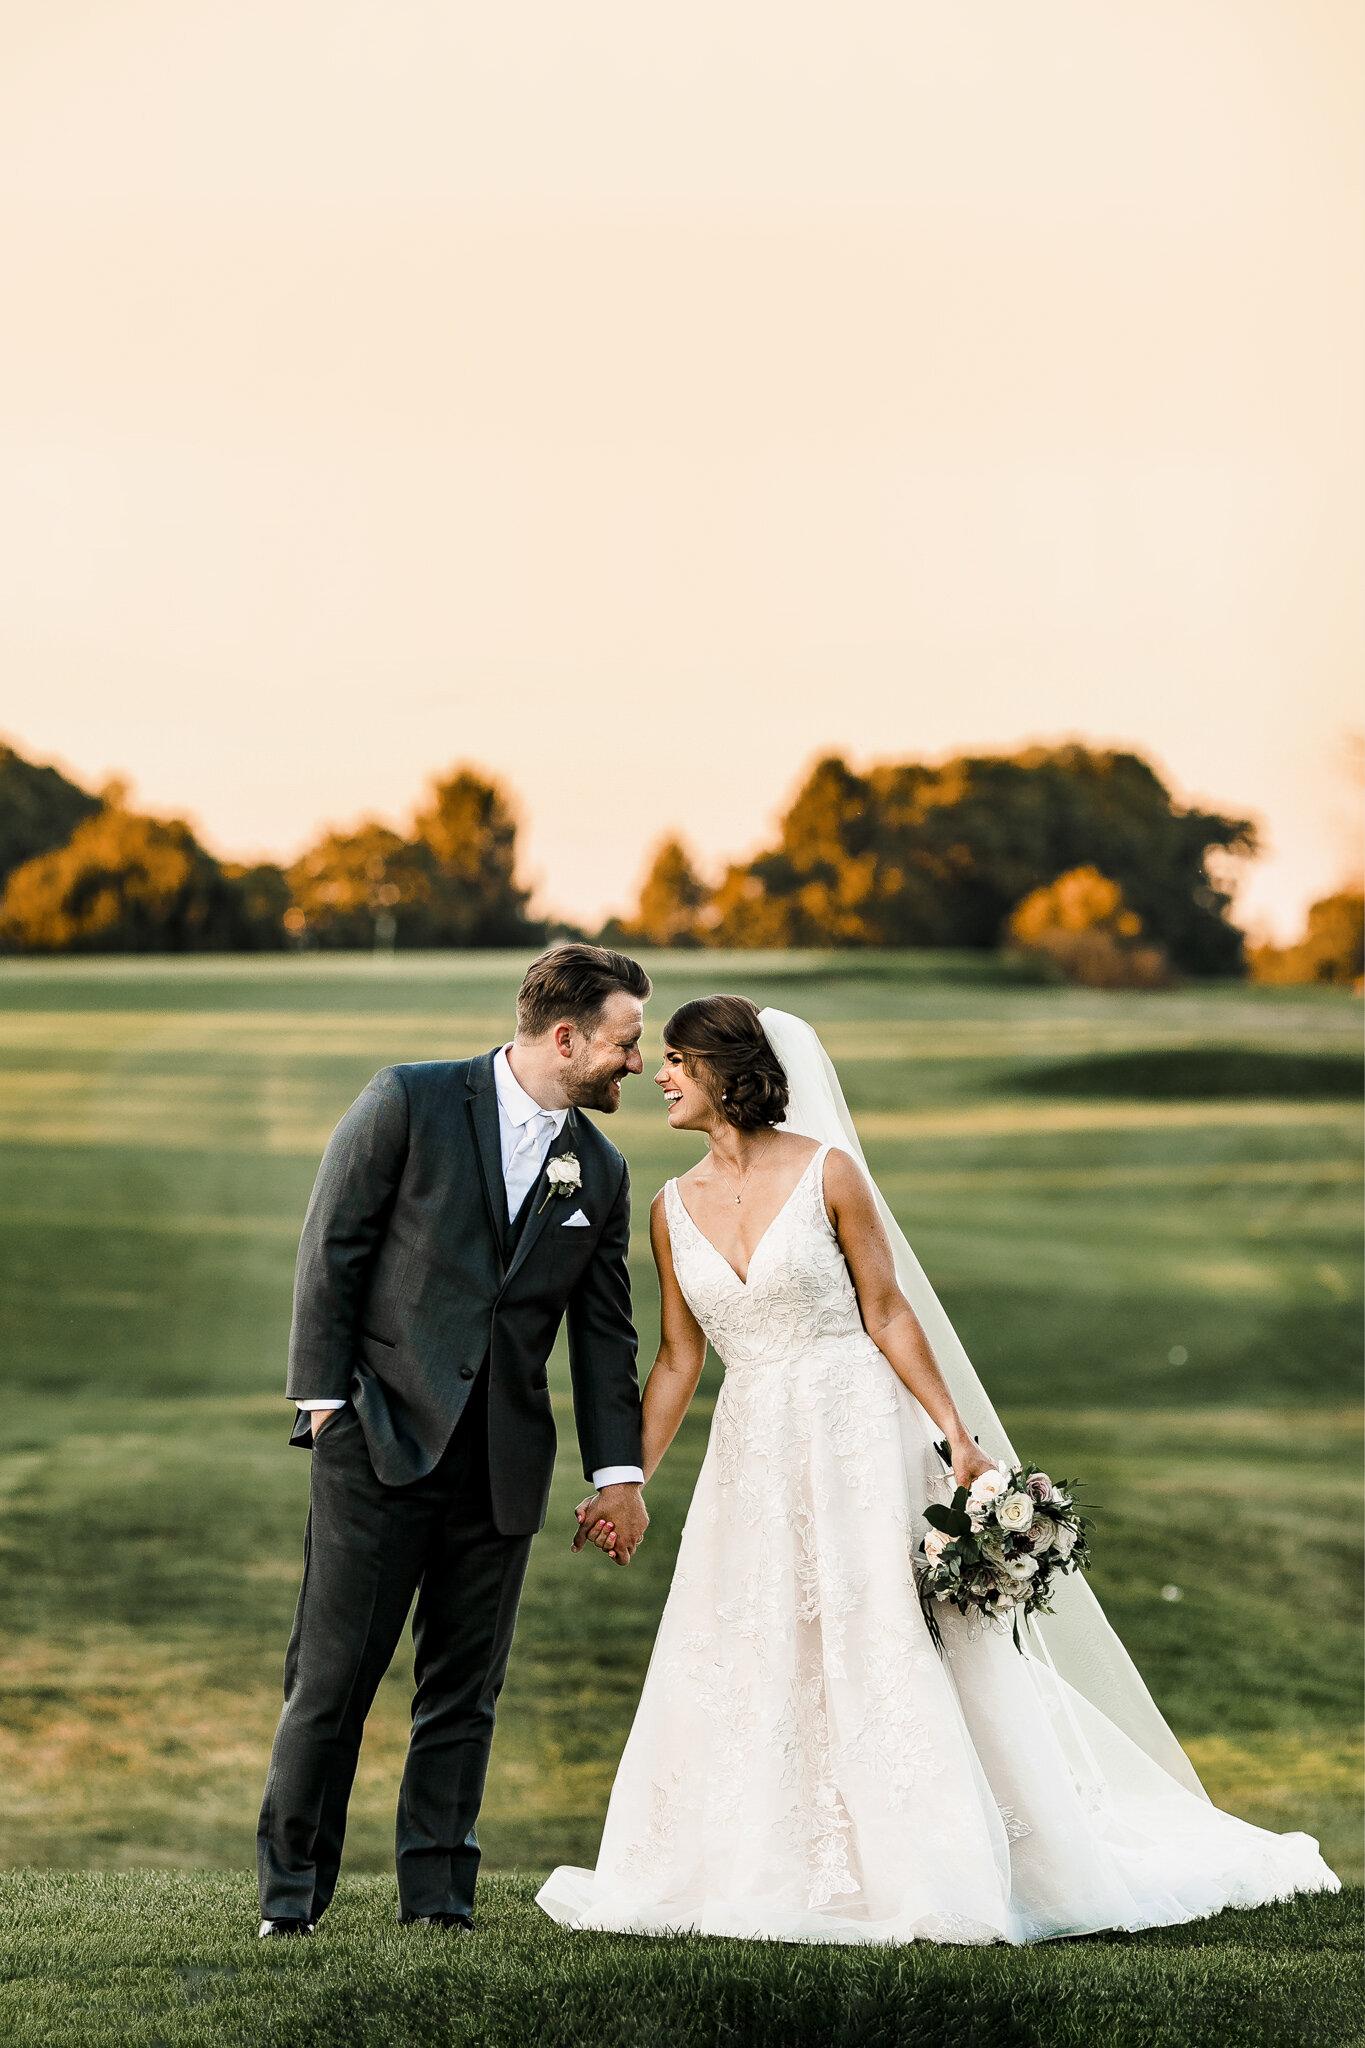 Coyle-Forsgate-Country-Club-Wedding-Photographer-29.JPG